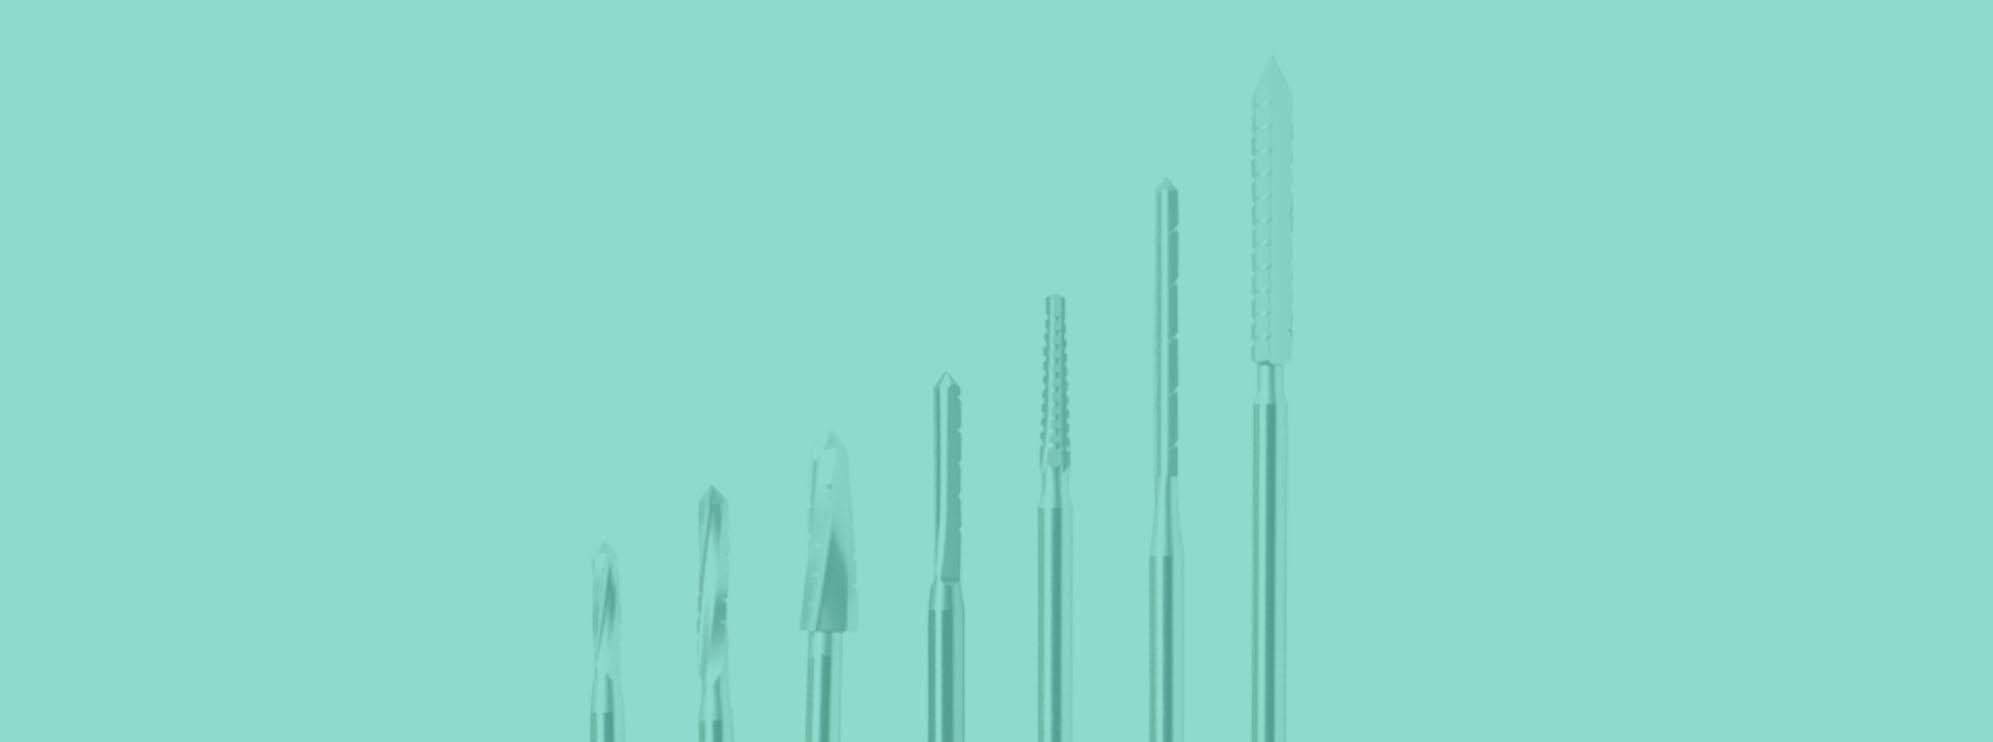 Chirurgie percutanée, mini-invasive Genève